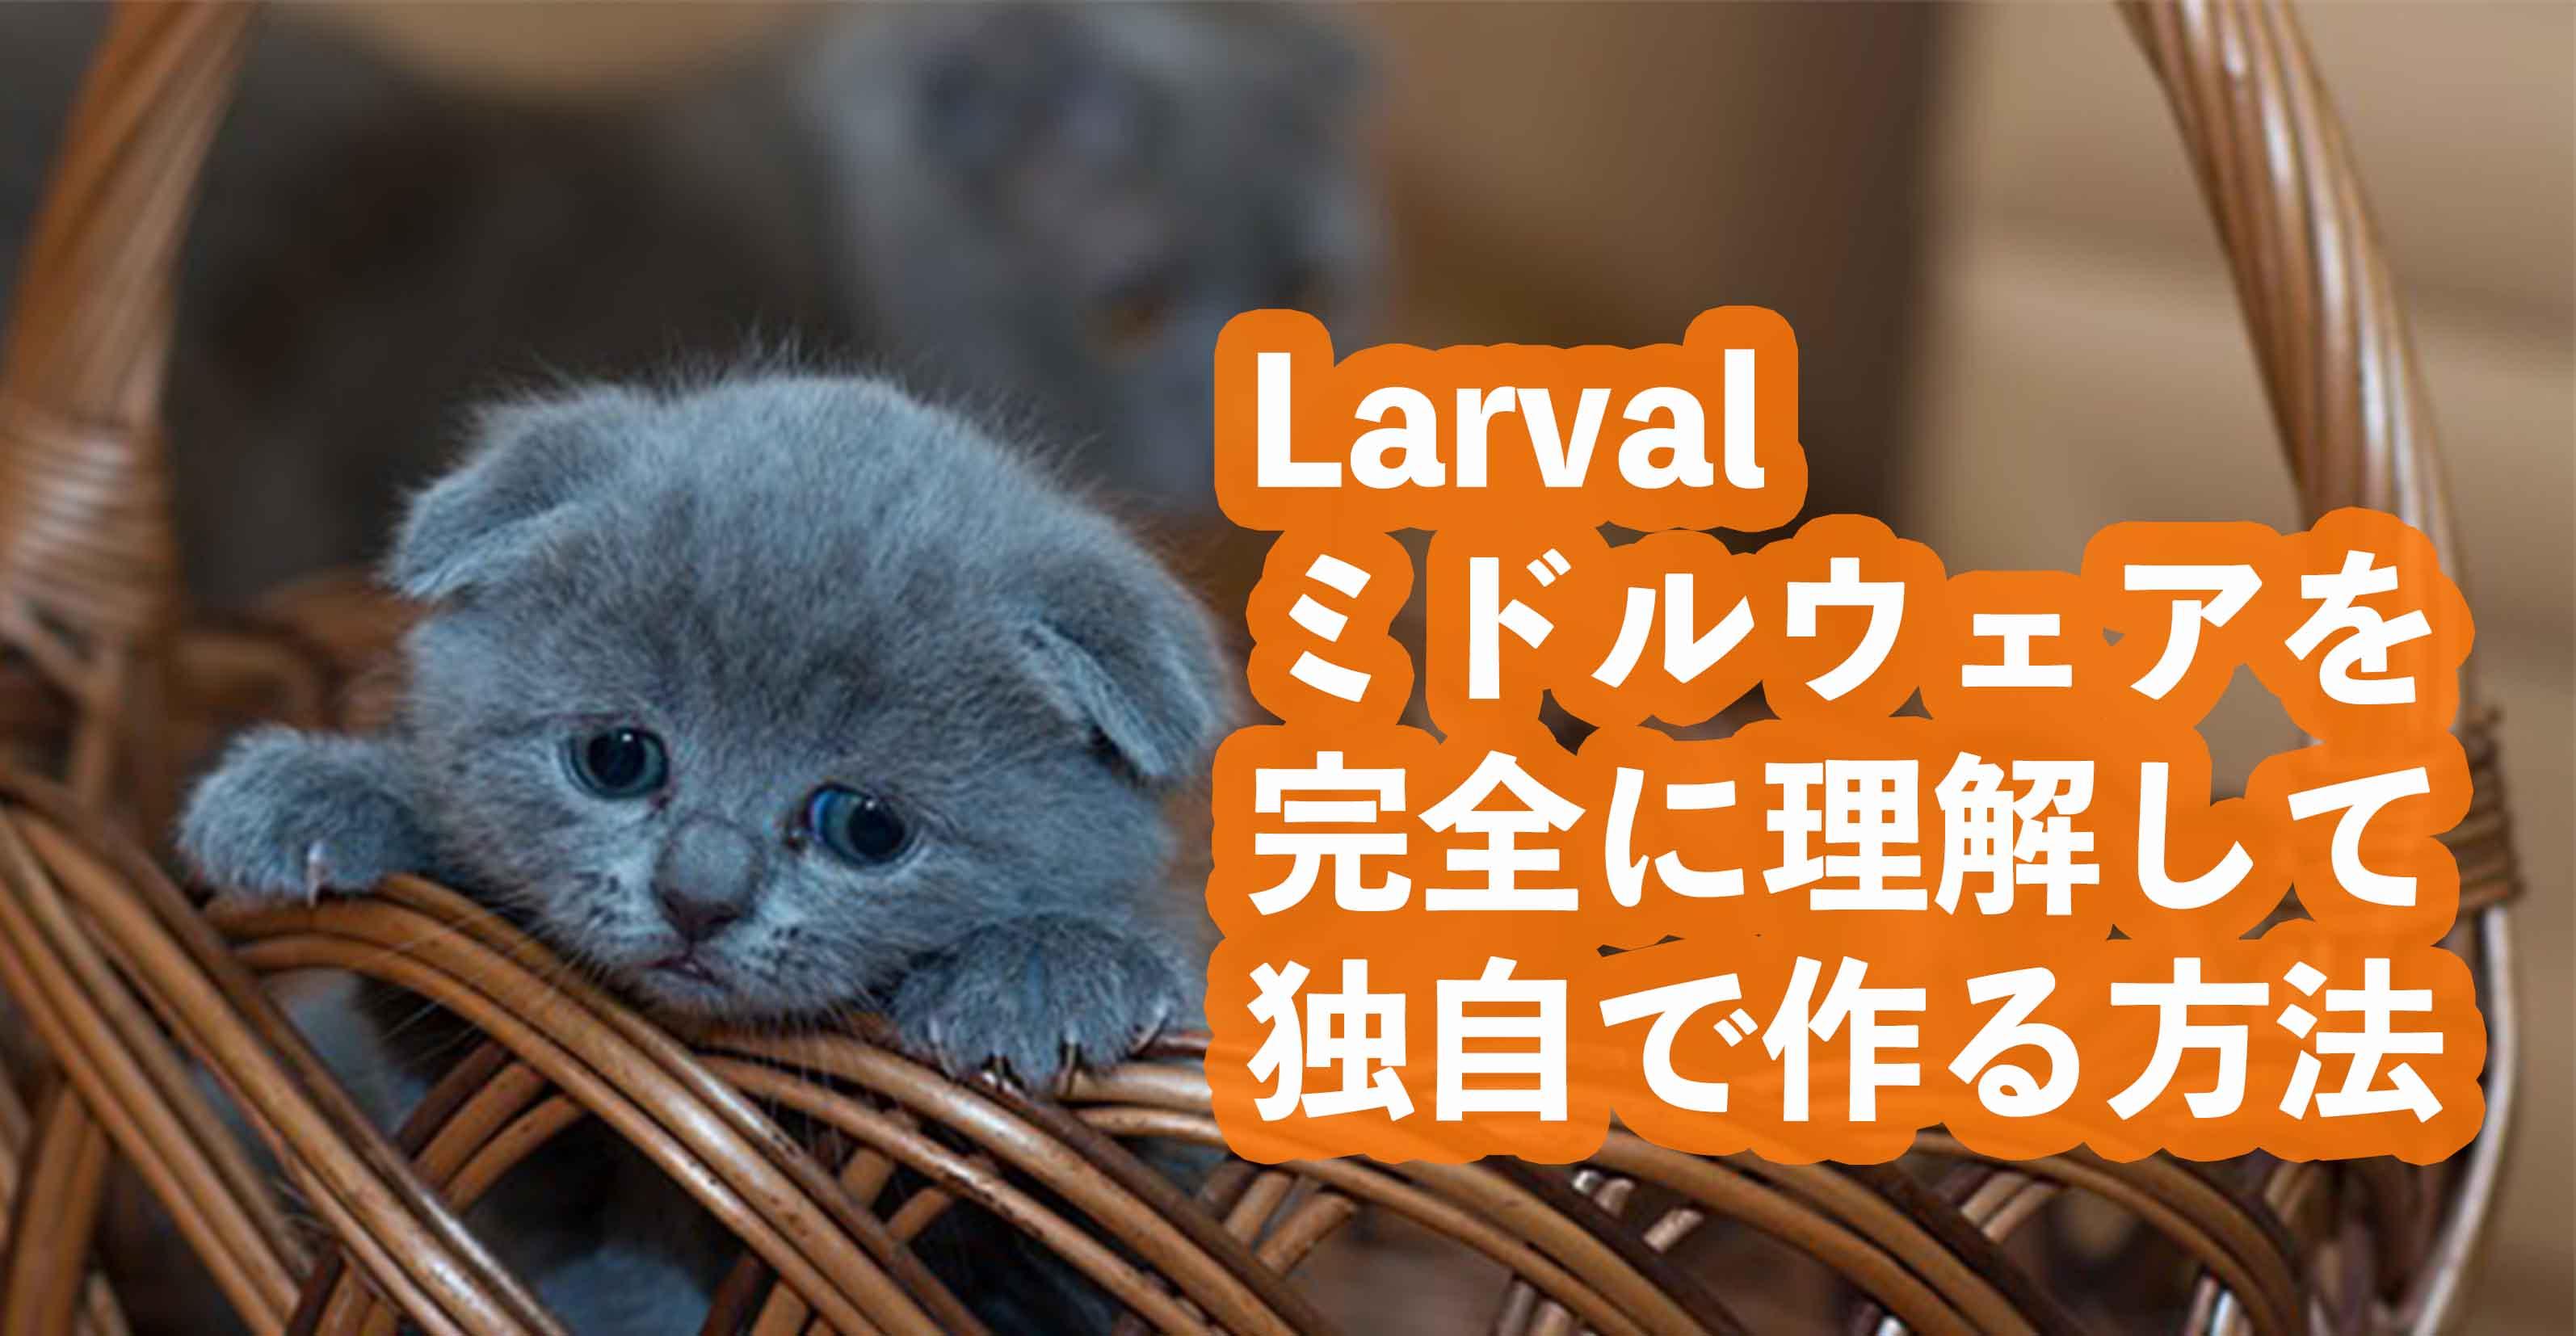 Larval ミドルウェアを完全に理解して独自で作る方法